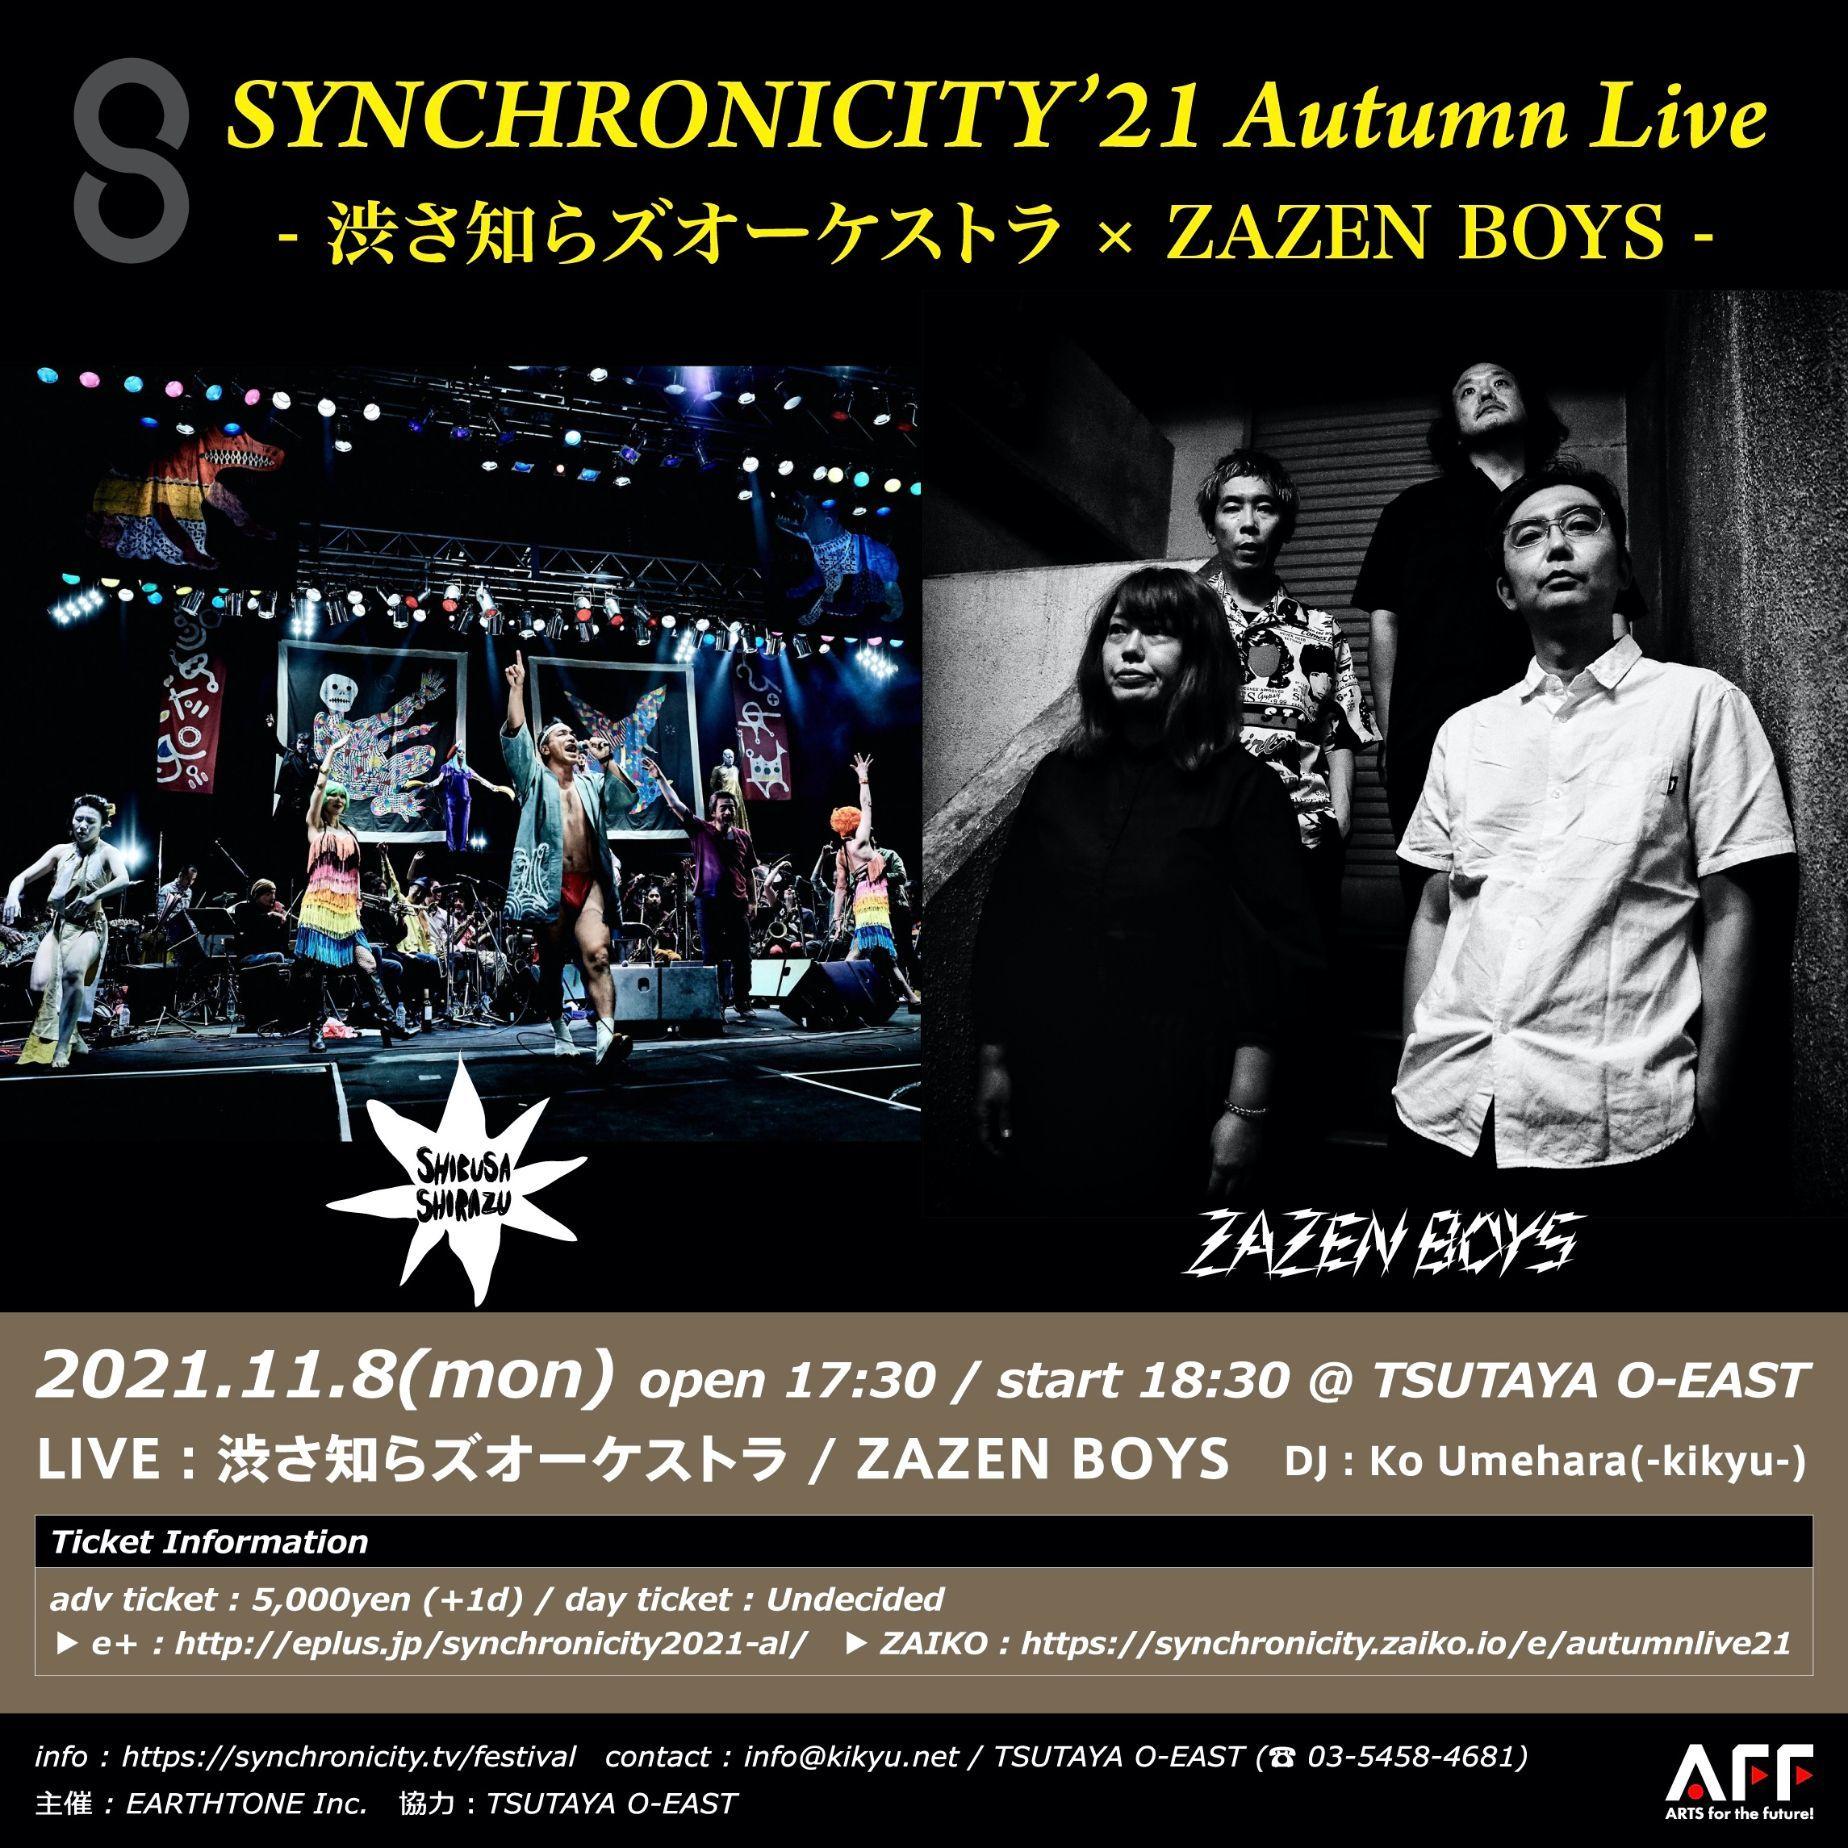 『SYNCHRONICITY'21 Autumn Live』